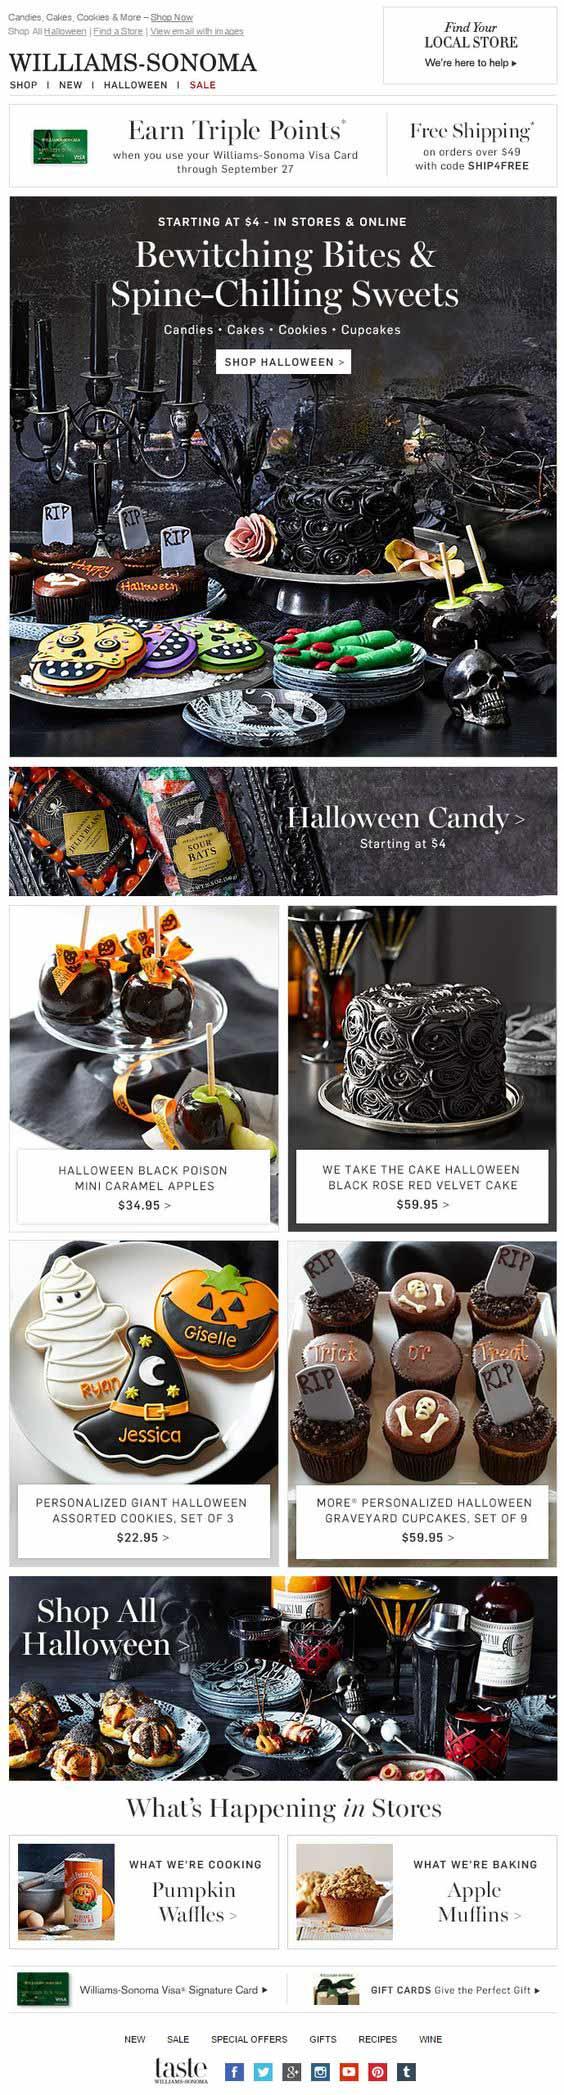 Halloween-Email-Templates_Williams-Sonoma